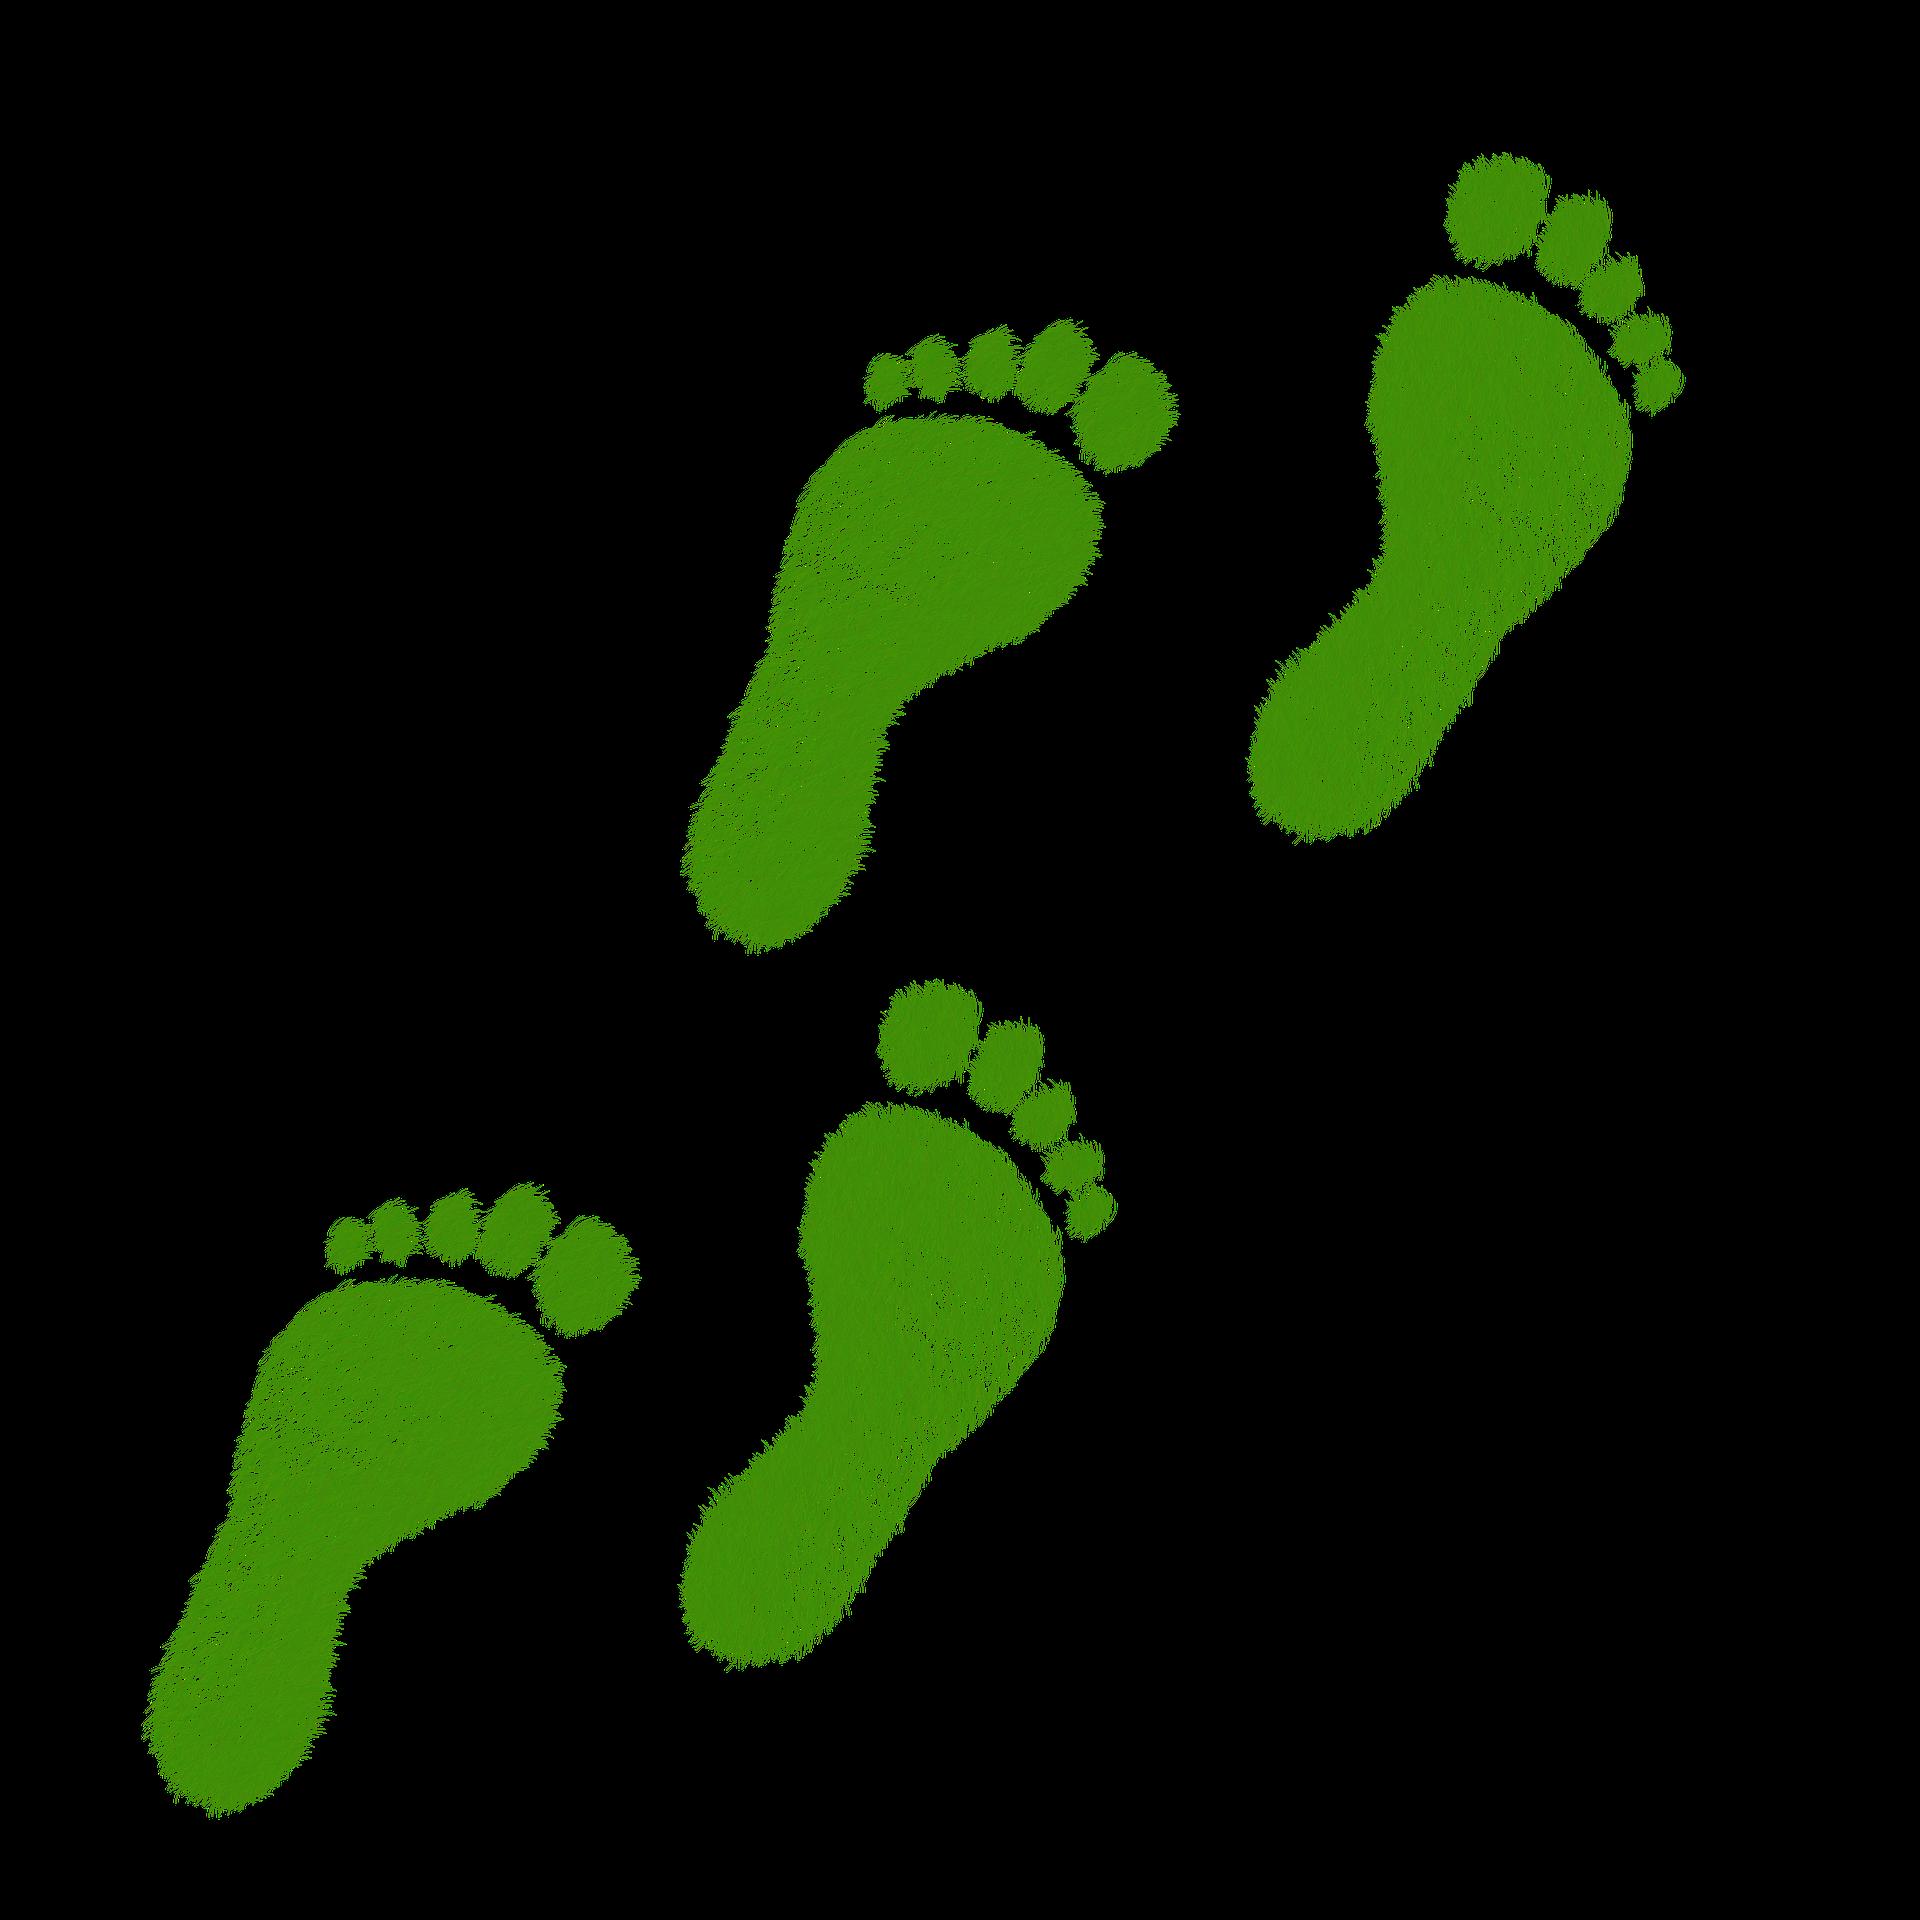 ¿Sabes cuál es tu huella ecológica?